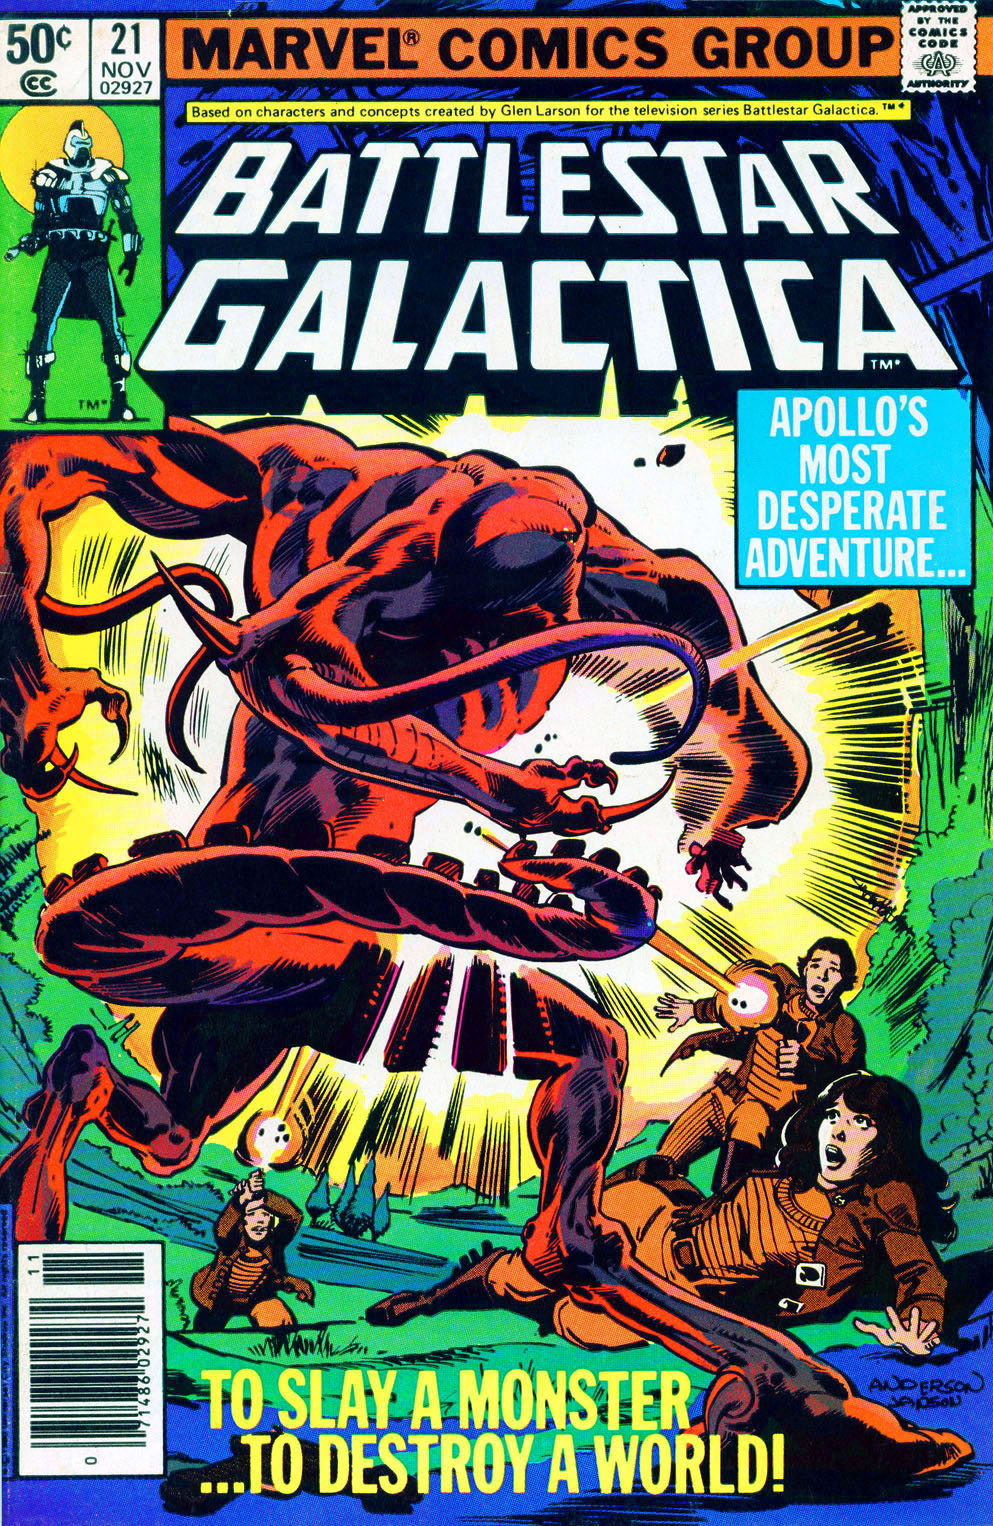 Battlestar Galactica 21 Page 1